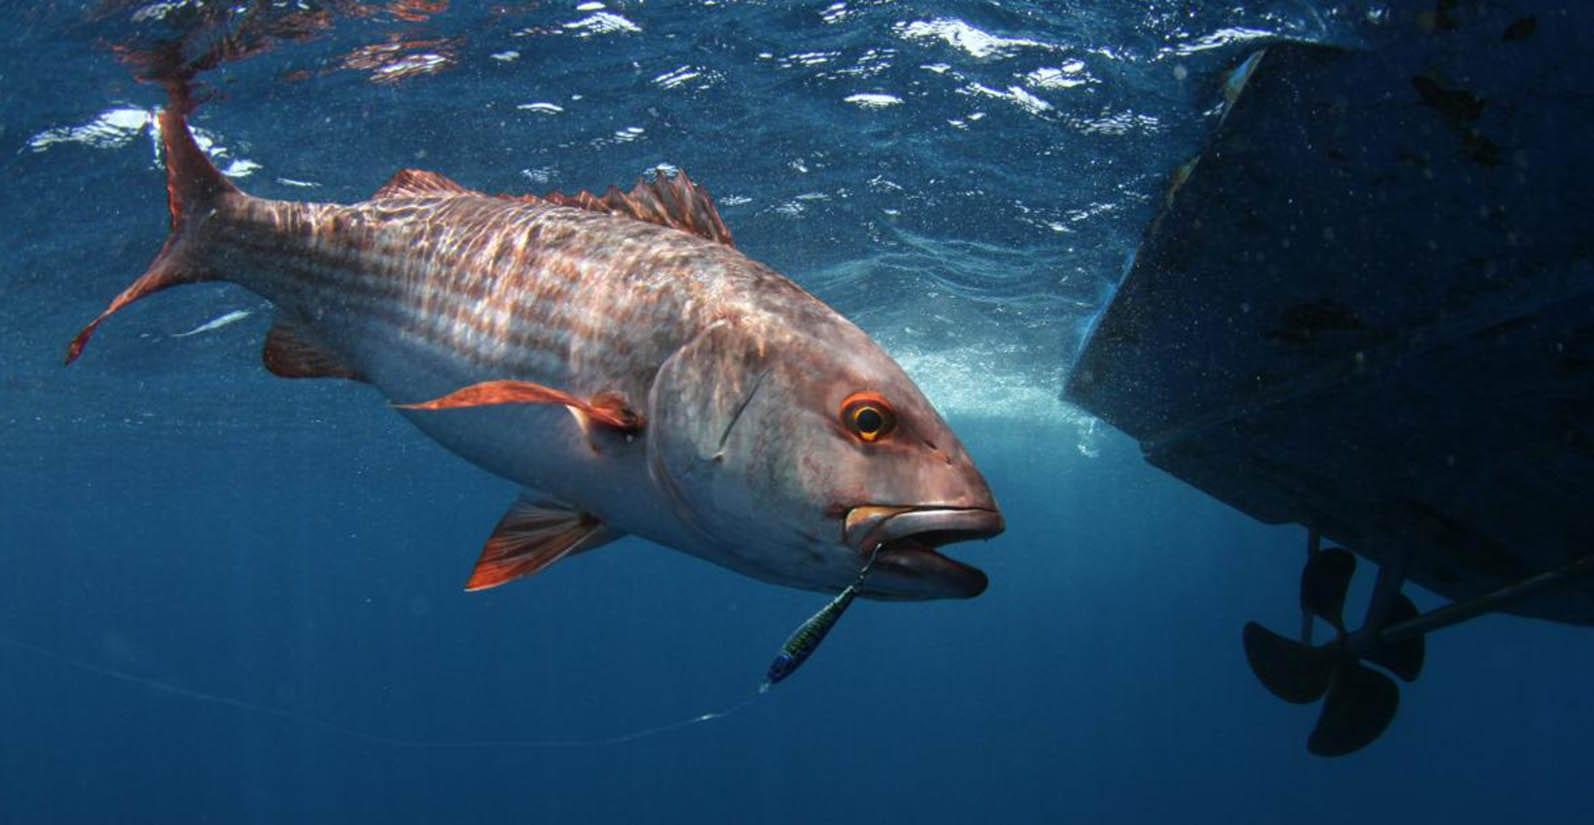 Panama sport fishing